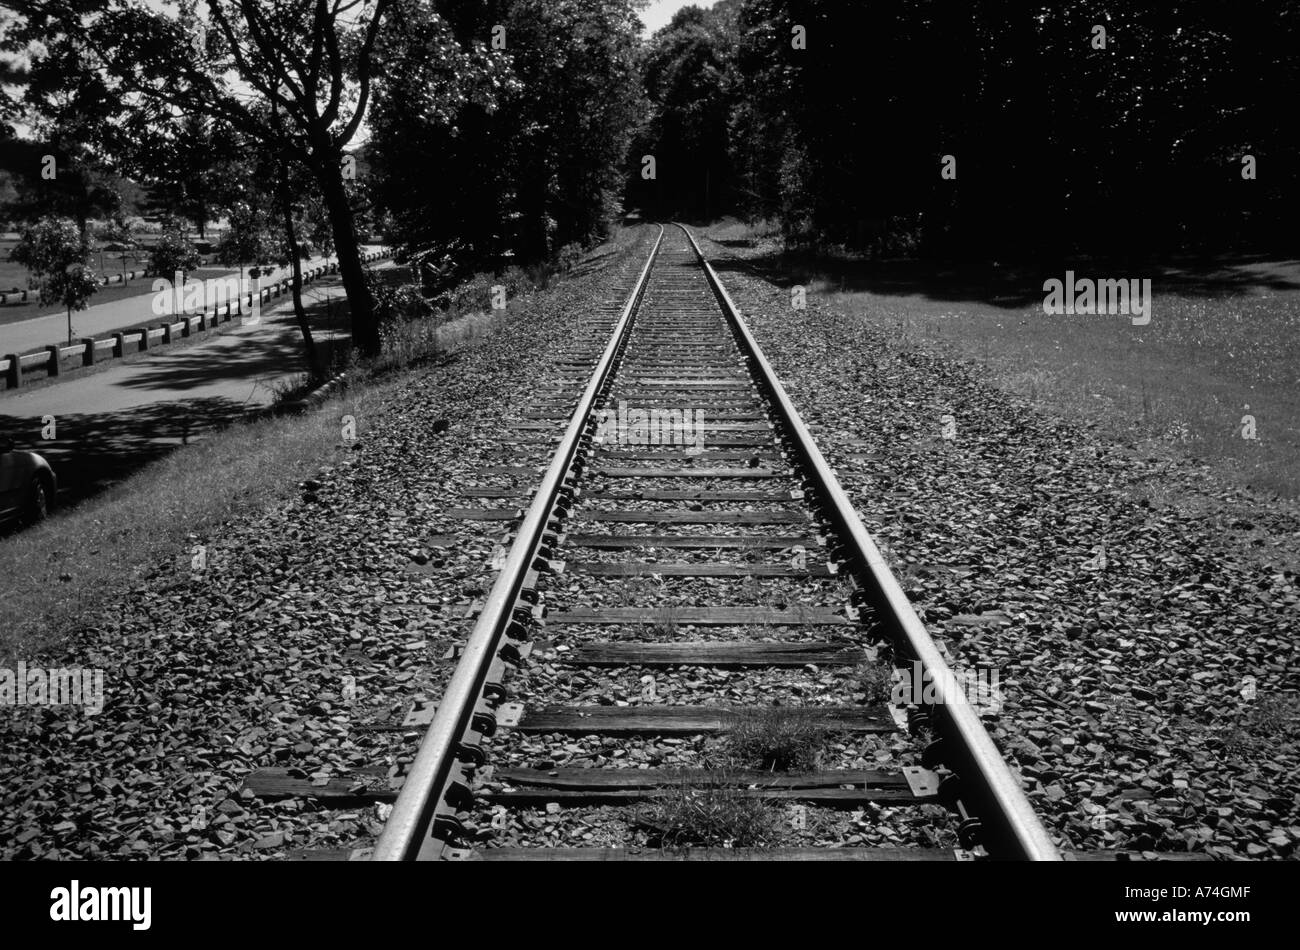 Train Tracks leading into distance - Stock Image